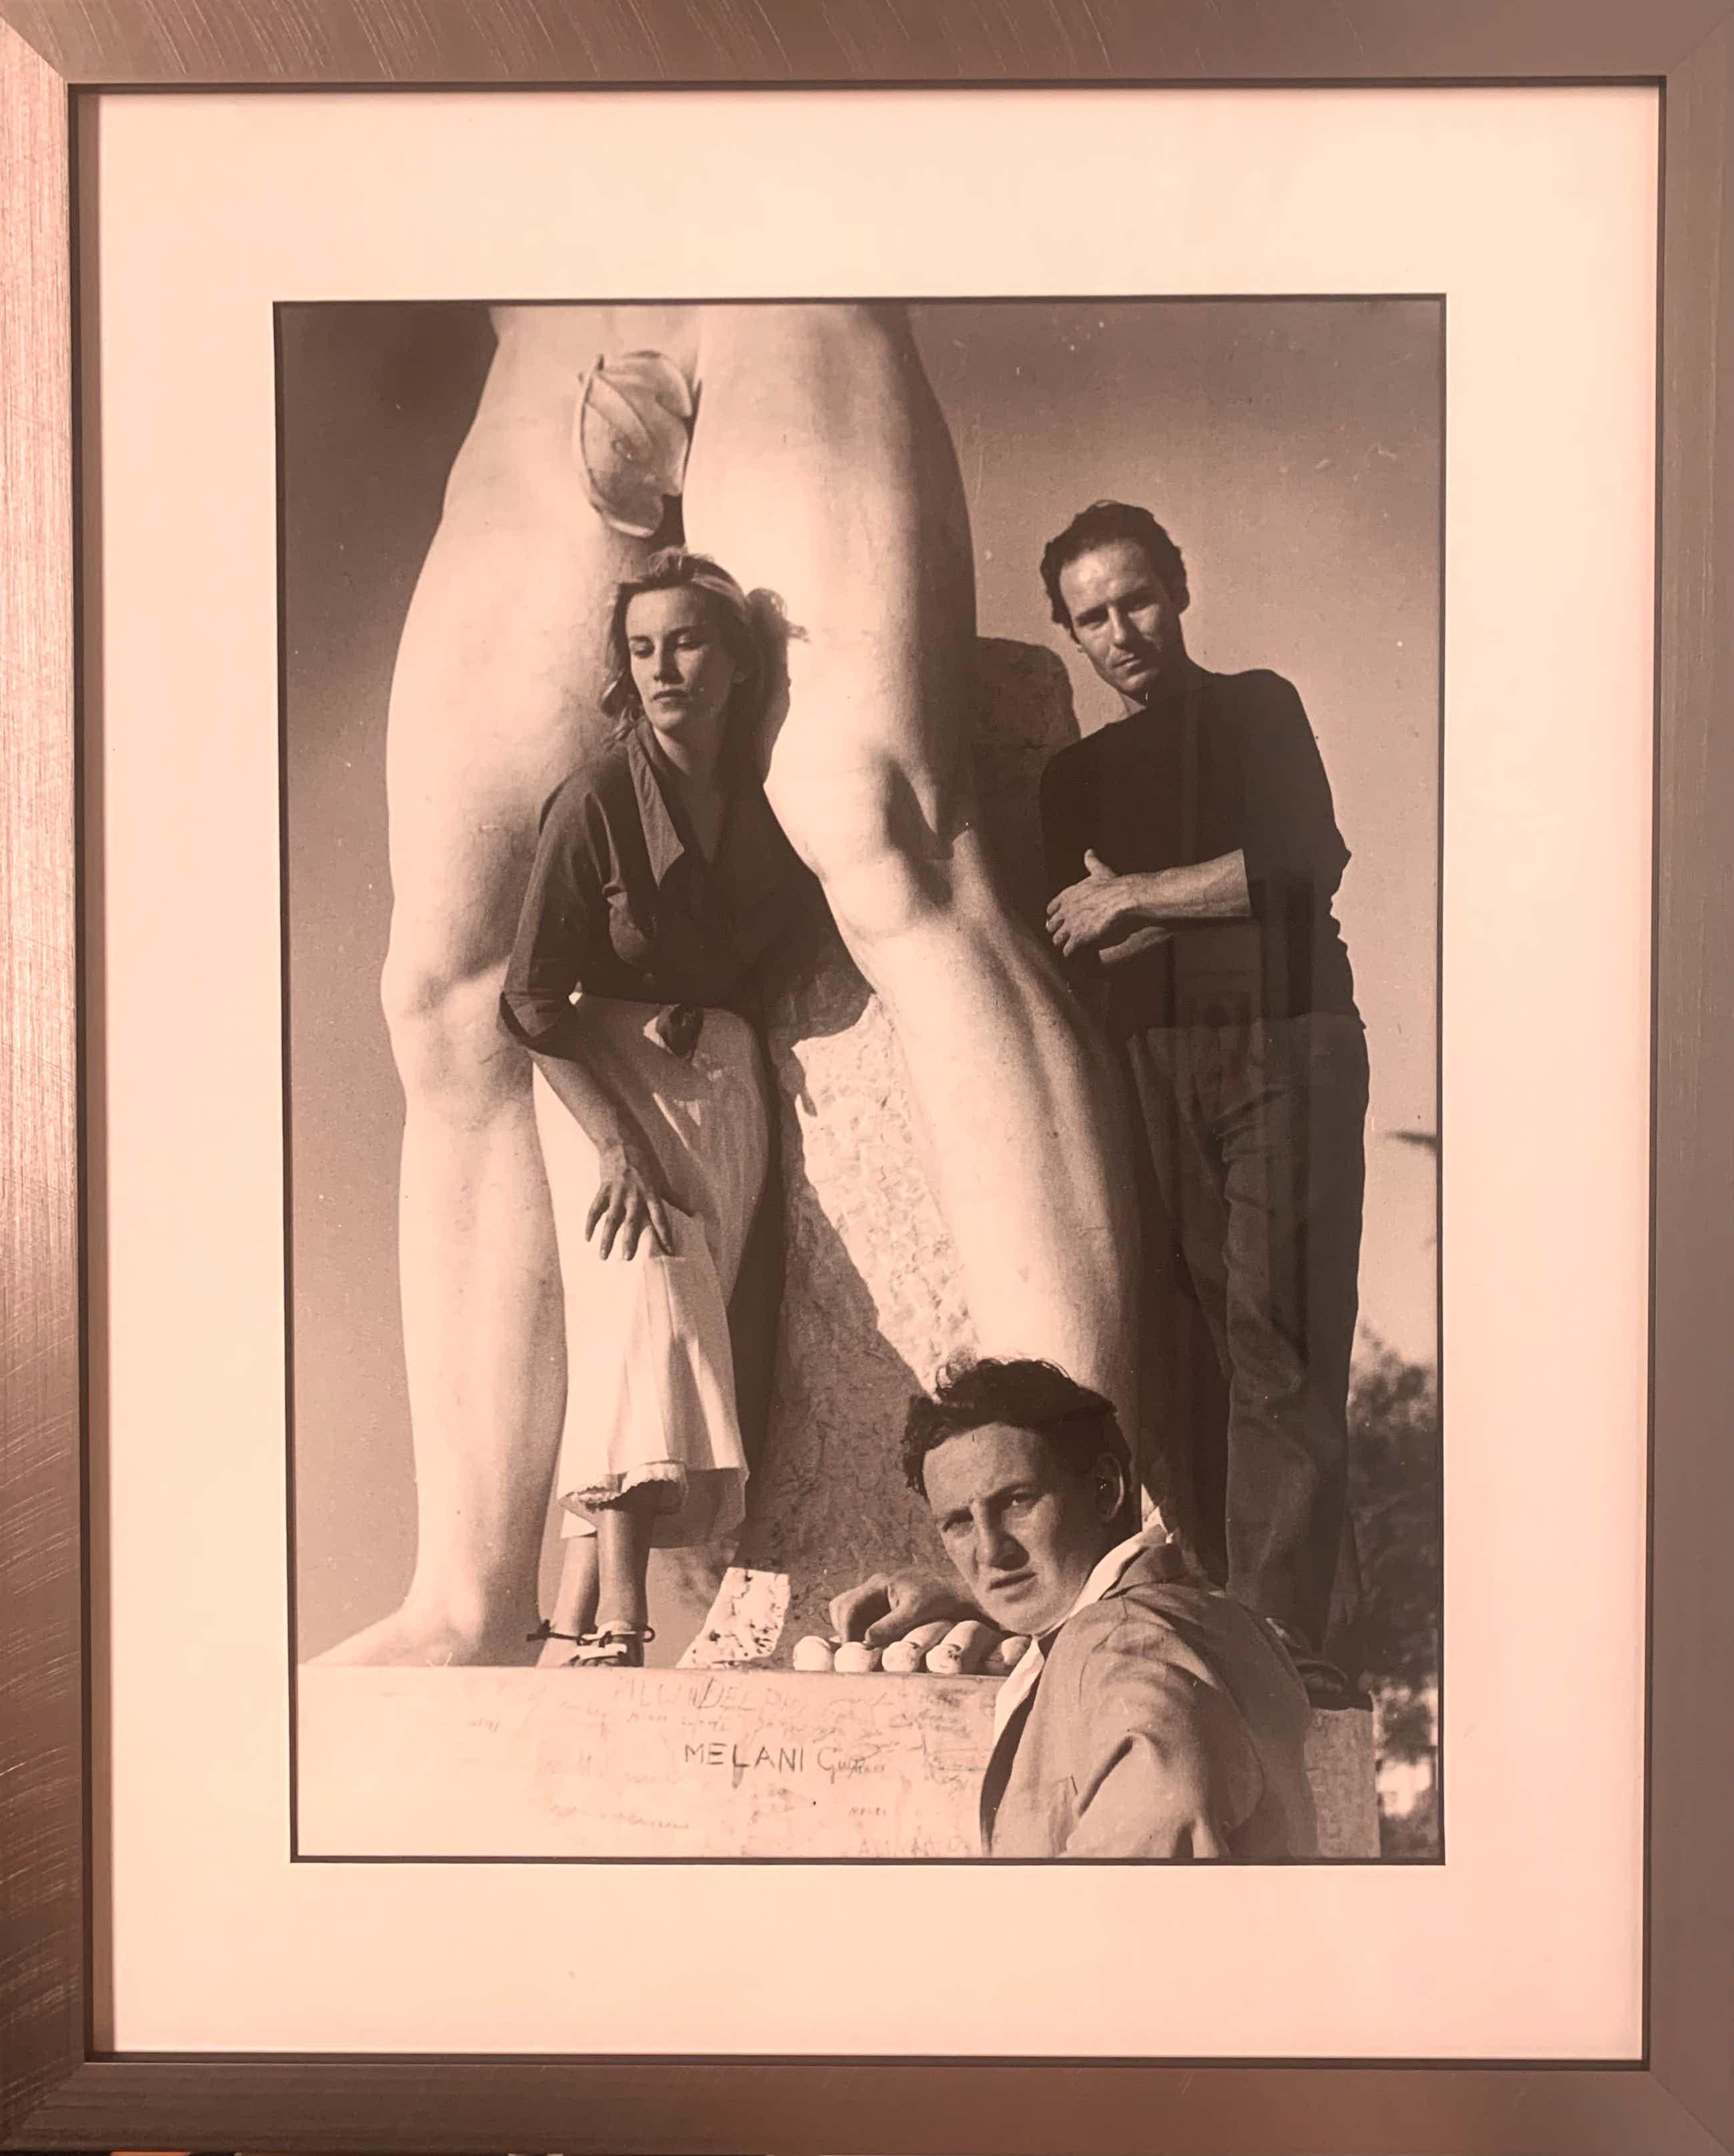 Henny Riemens - Melani's Hallo. Elly Claus, Hugo Claus en Corneille in Rome , 1954 kopen? Bied vanaf 400!